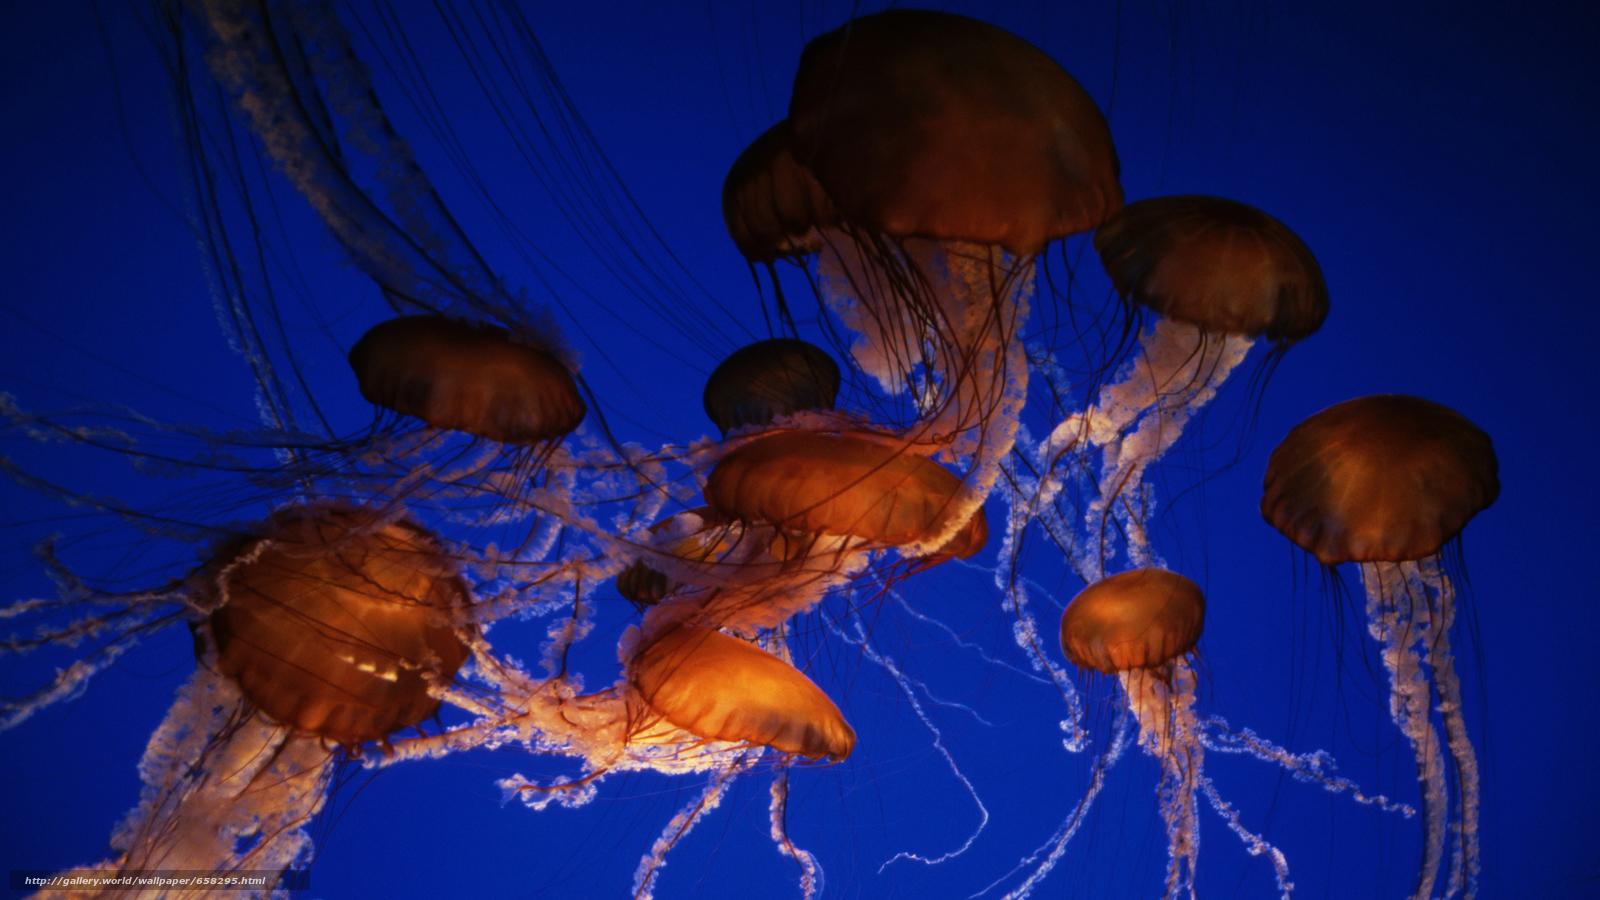 Descargar gratis medusa,  Medusa,  Mundial de Actividades Subacuáticas,  agua Fondos de escritorio en la resolucin 3840x2160 — imagen №658295